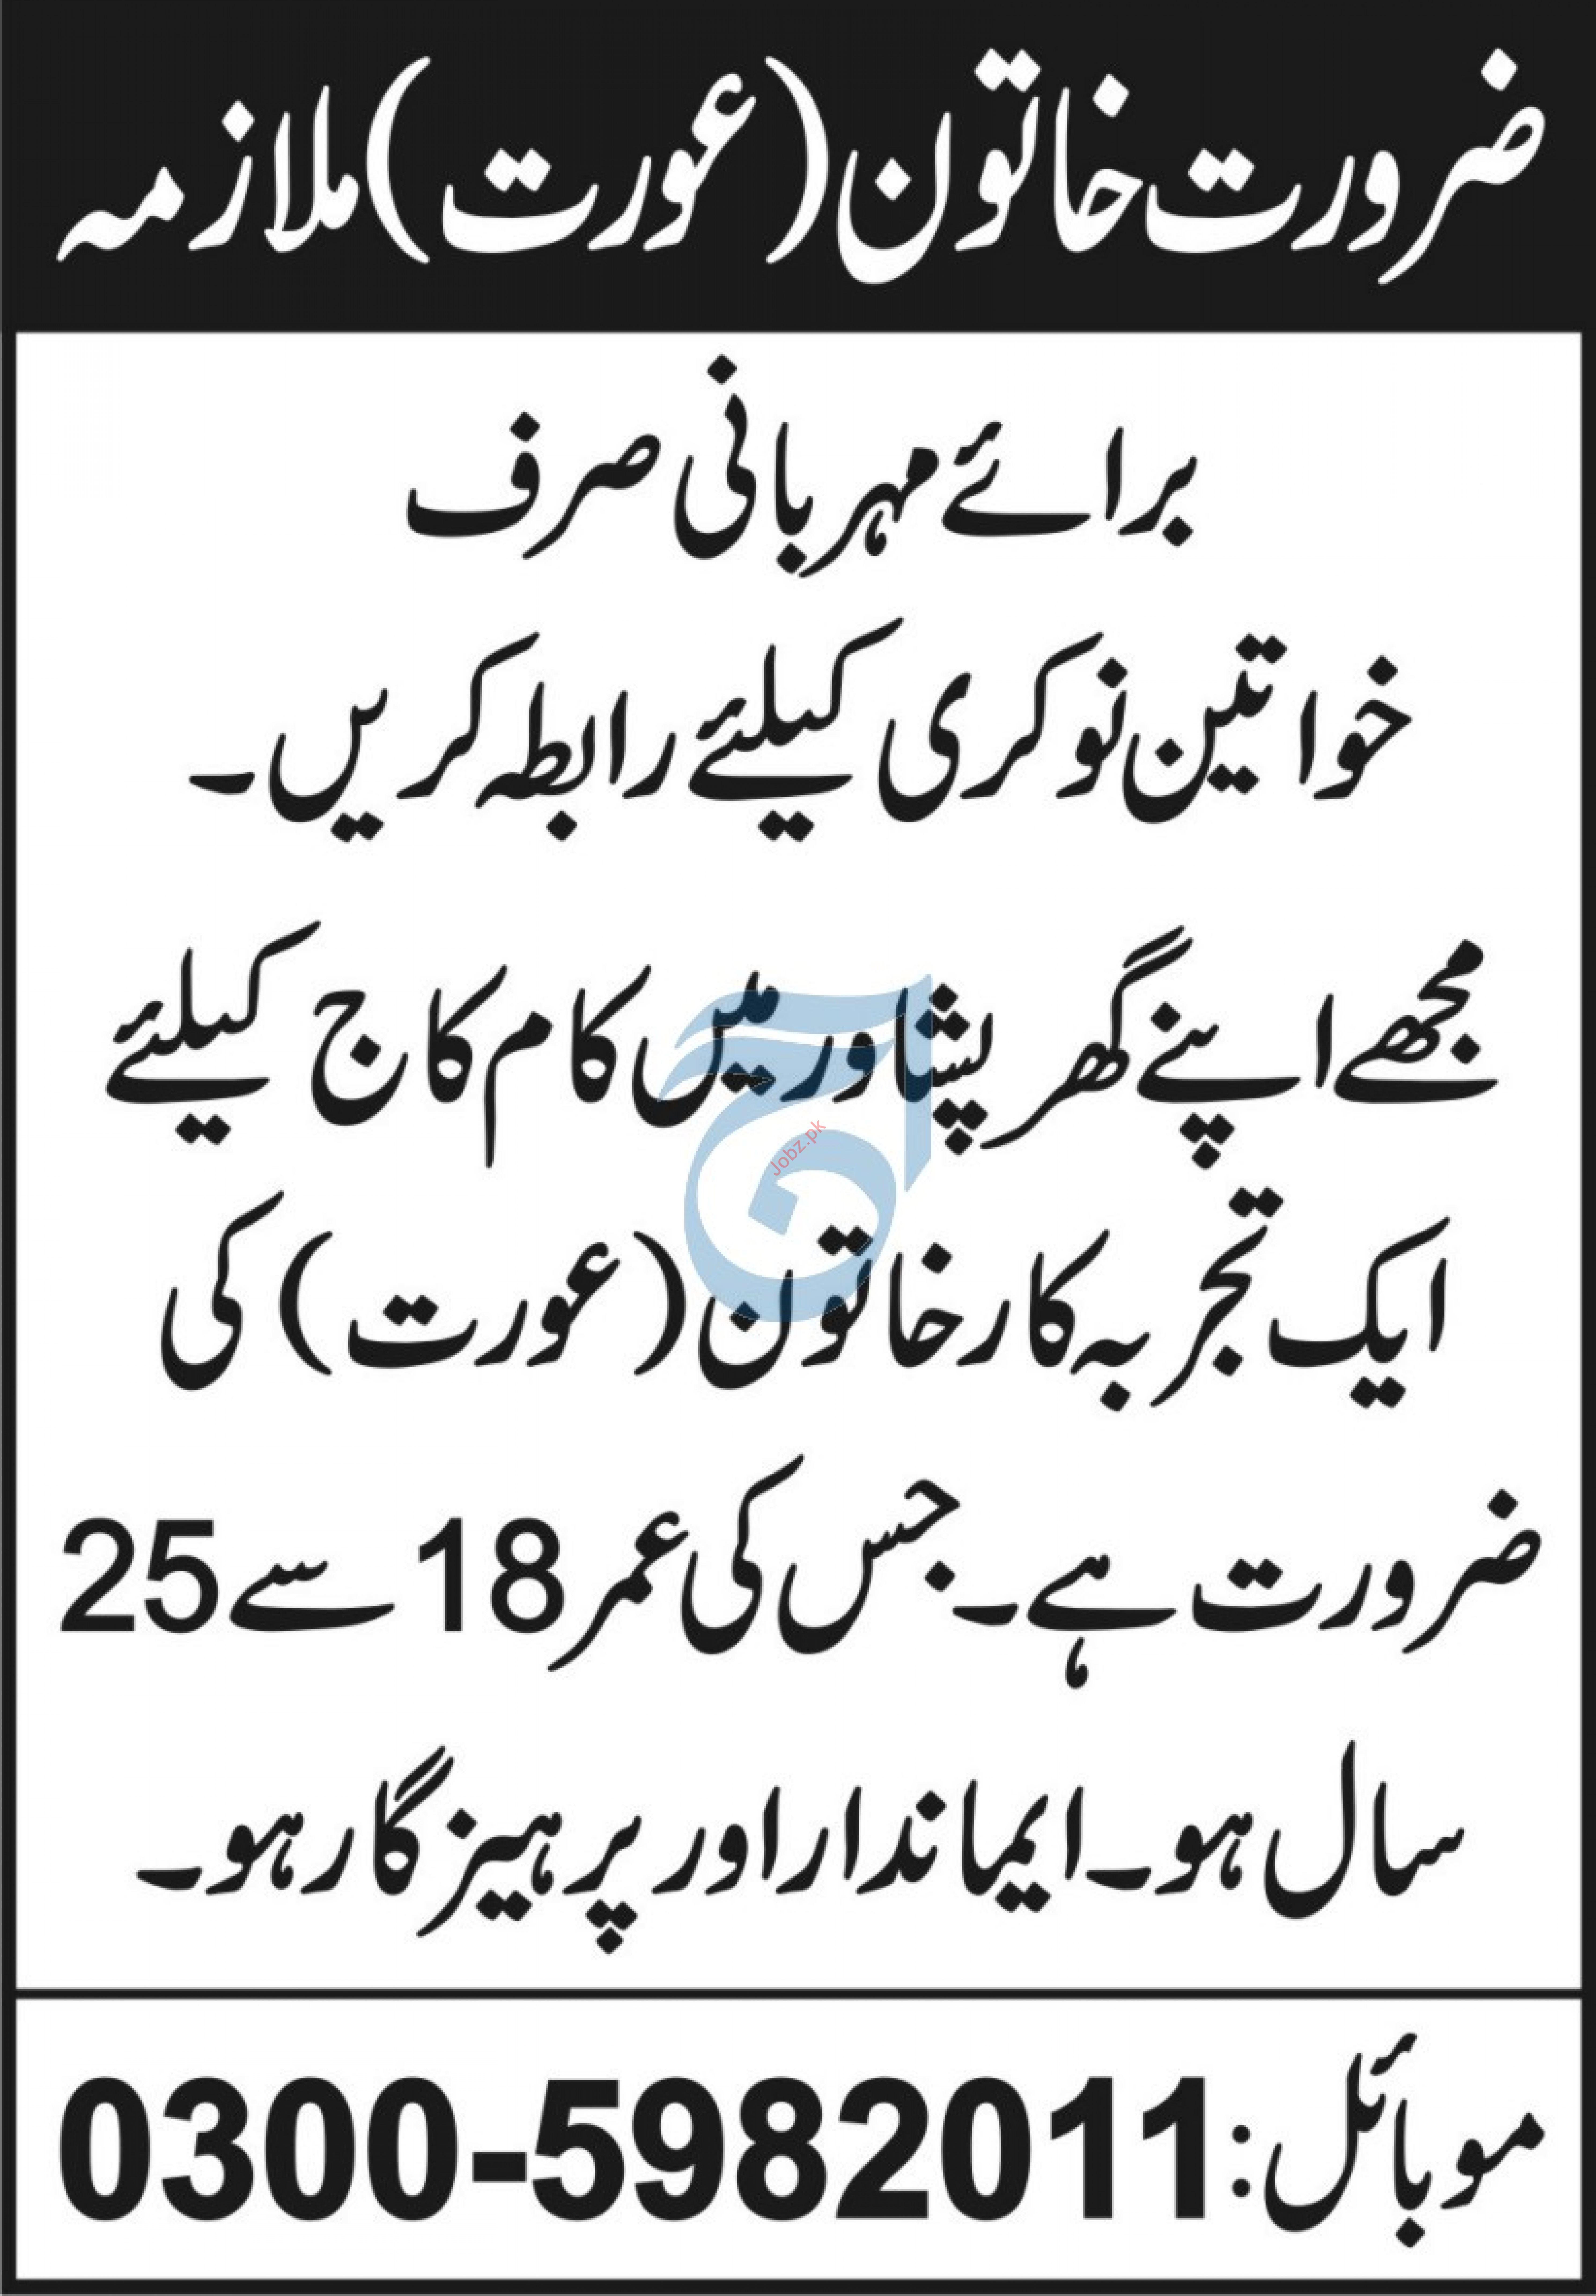 House Staff Jobs 2020 in Peshawar